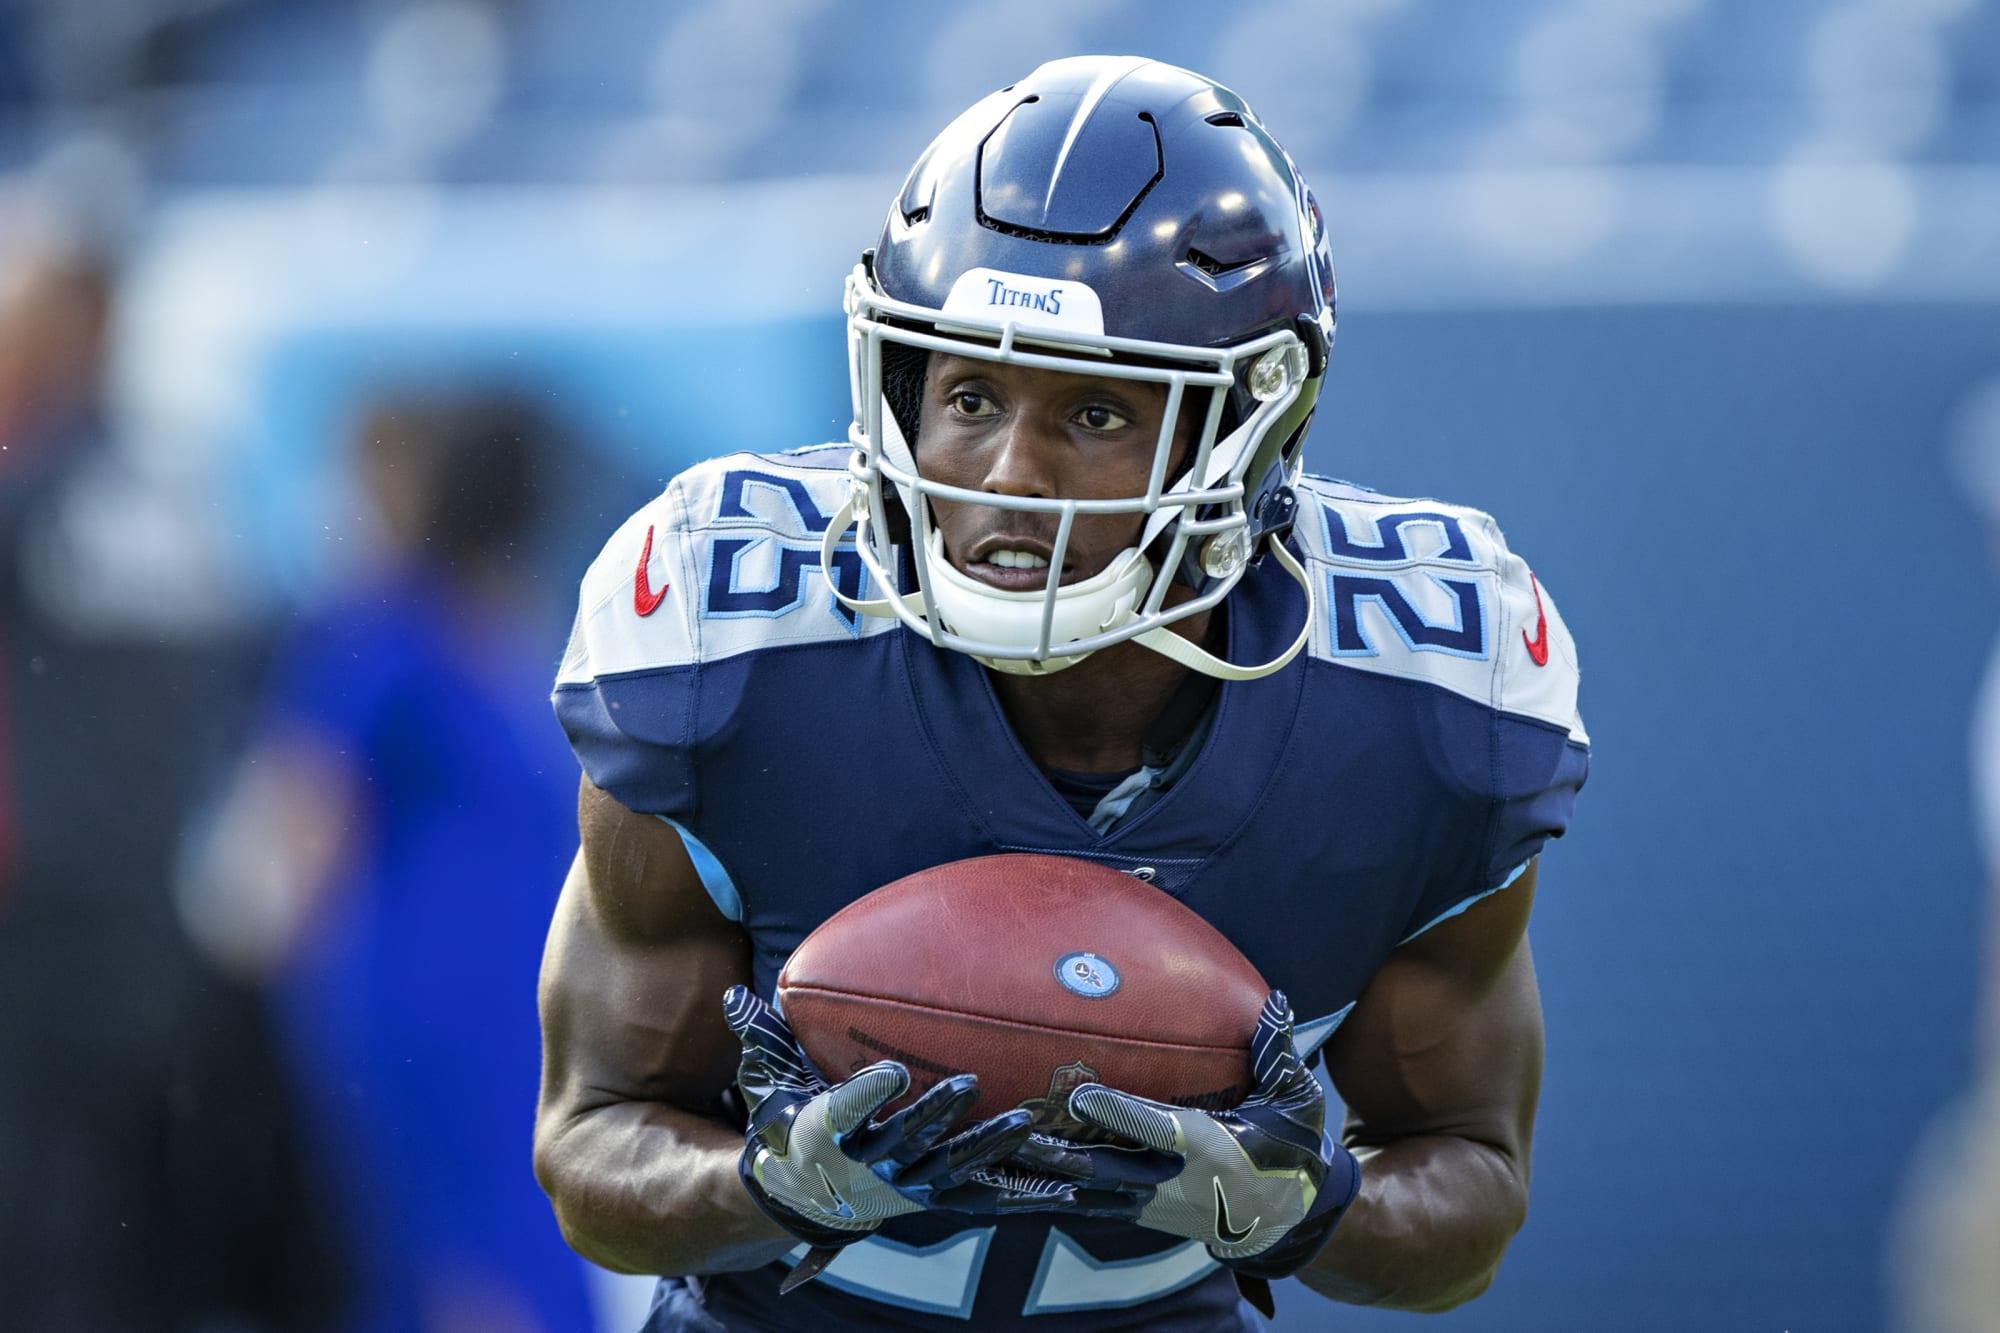 NY Giants: Why Adoree' Jackson solidifies the pass defense